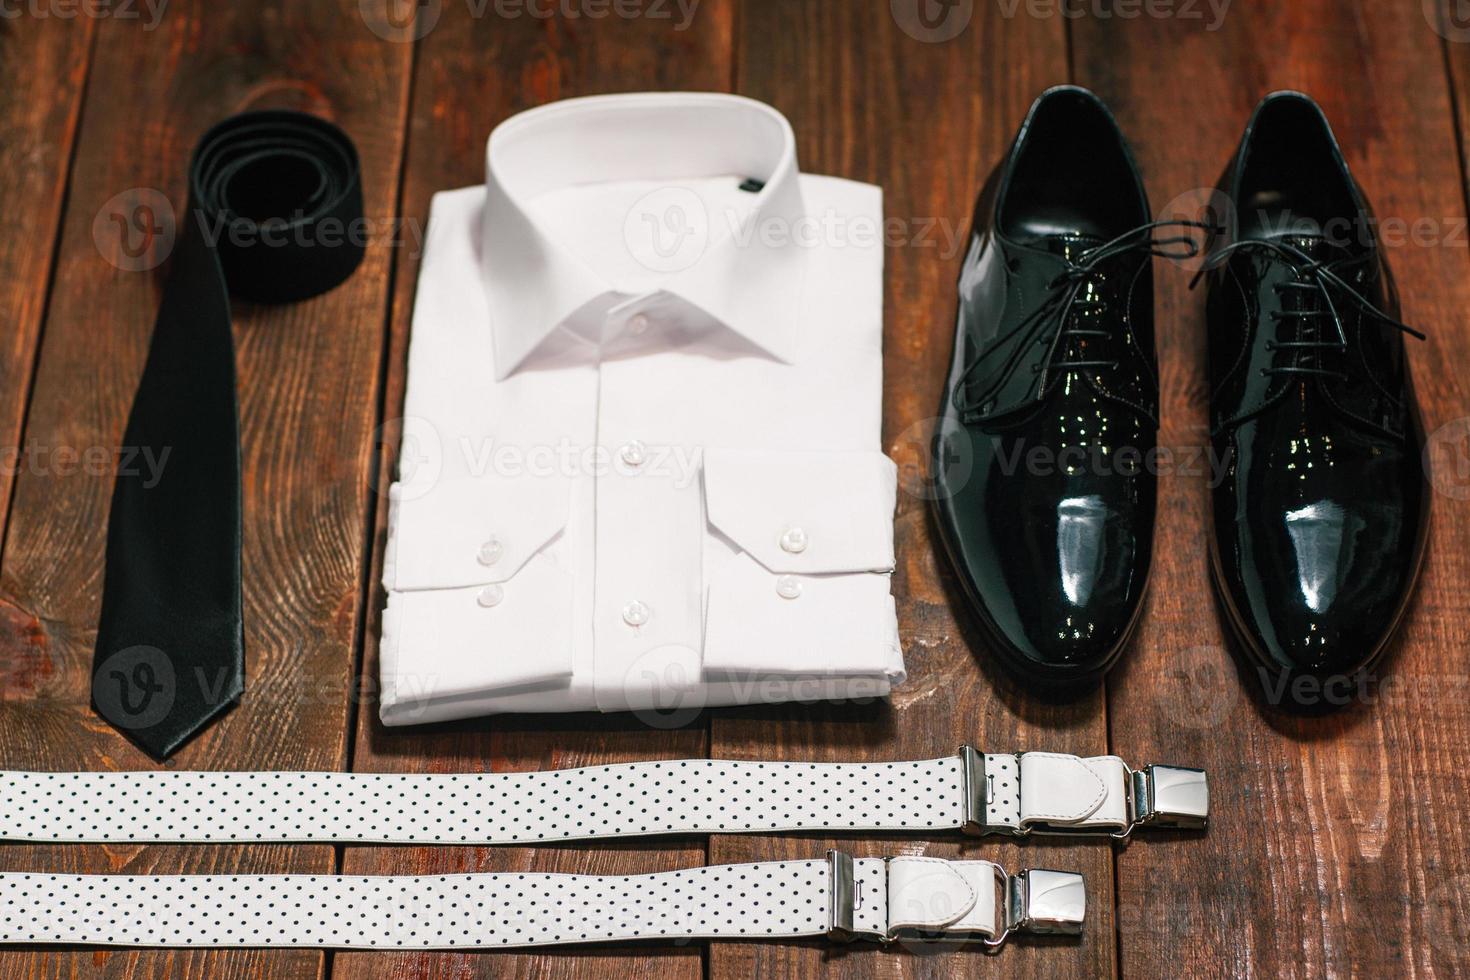 schwarze Krawatte, Lackschuhe, Hosenträger, ein weißes Hemd foto